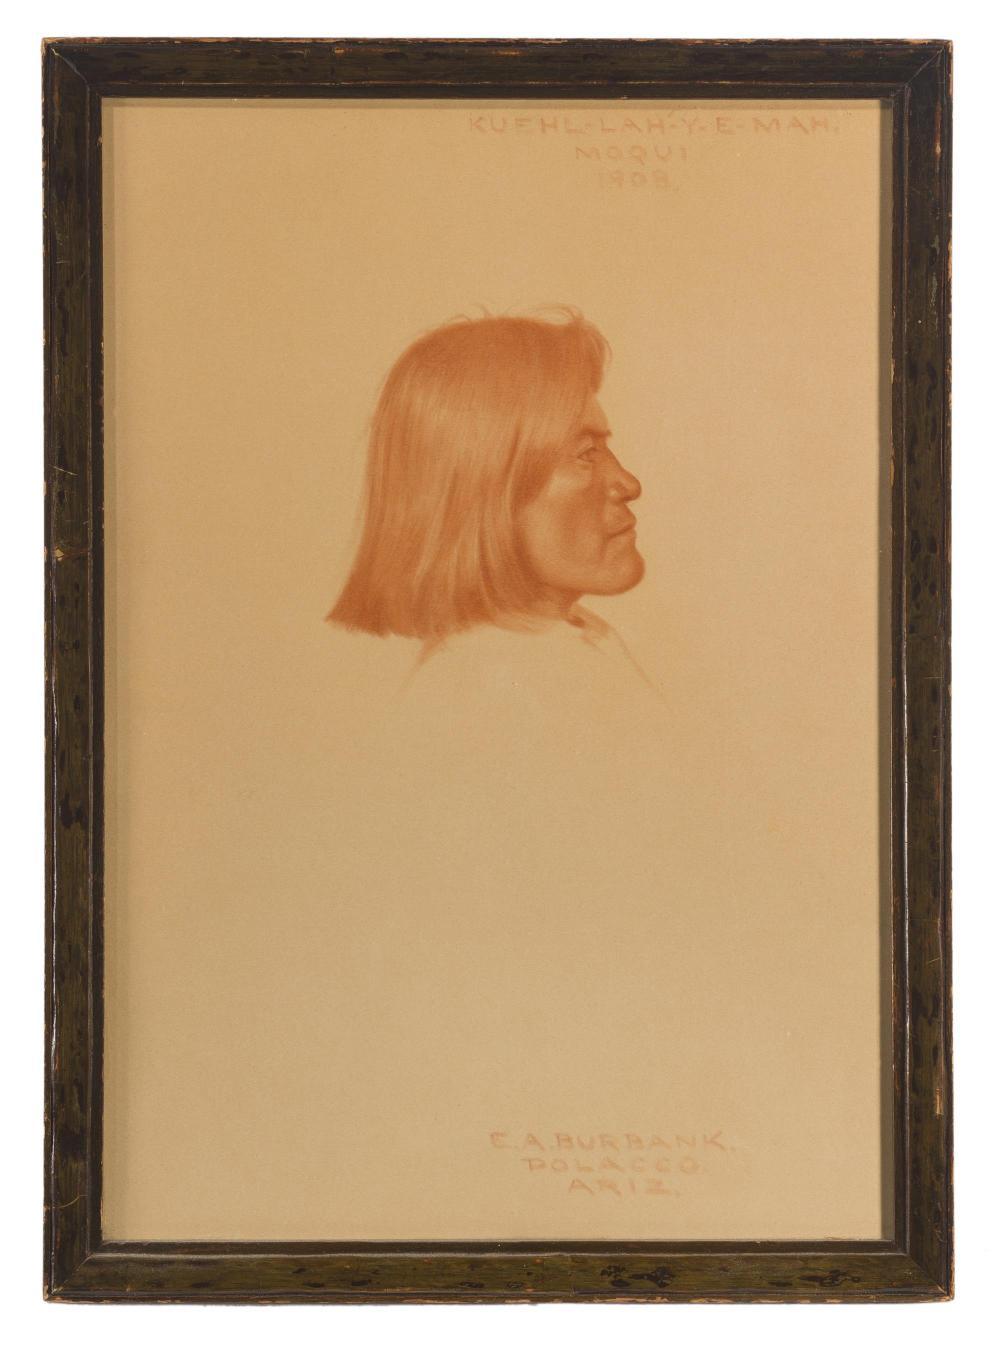 Elbridge Ayer Burbank, (1858-1949 San Francisco, CA),